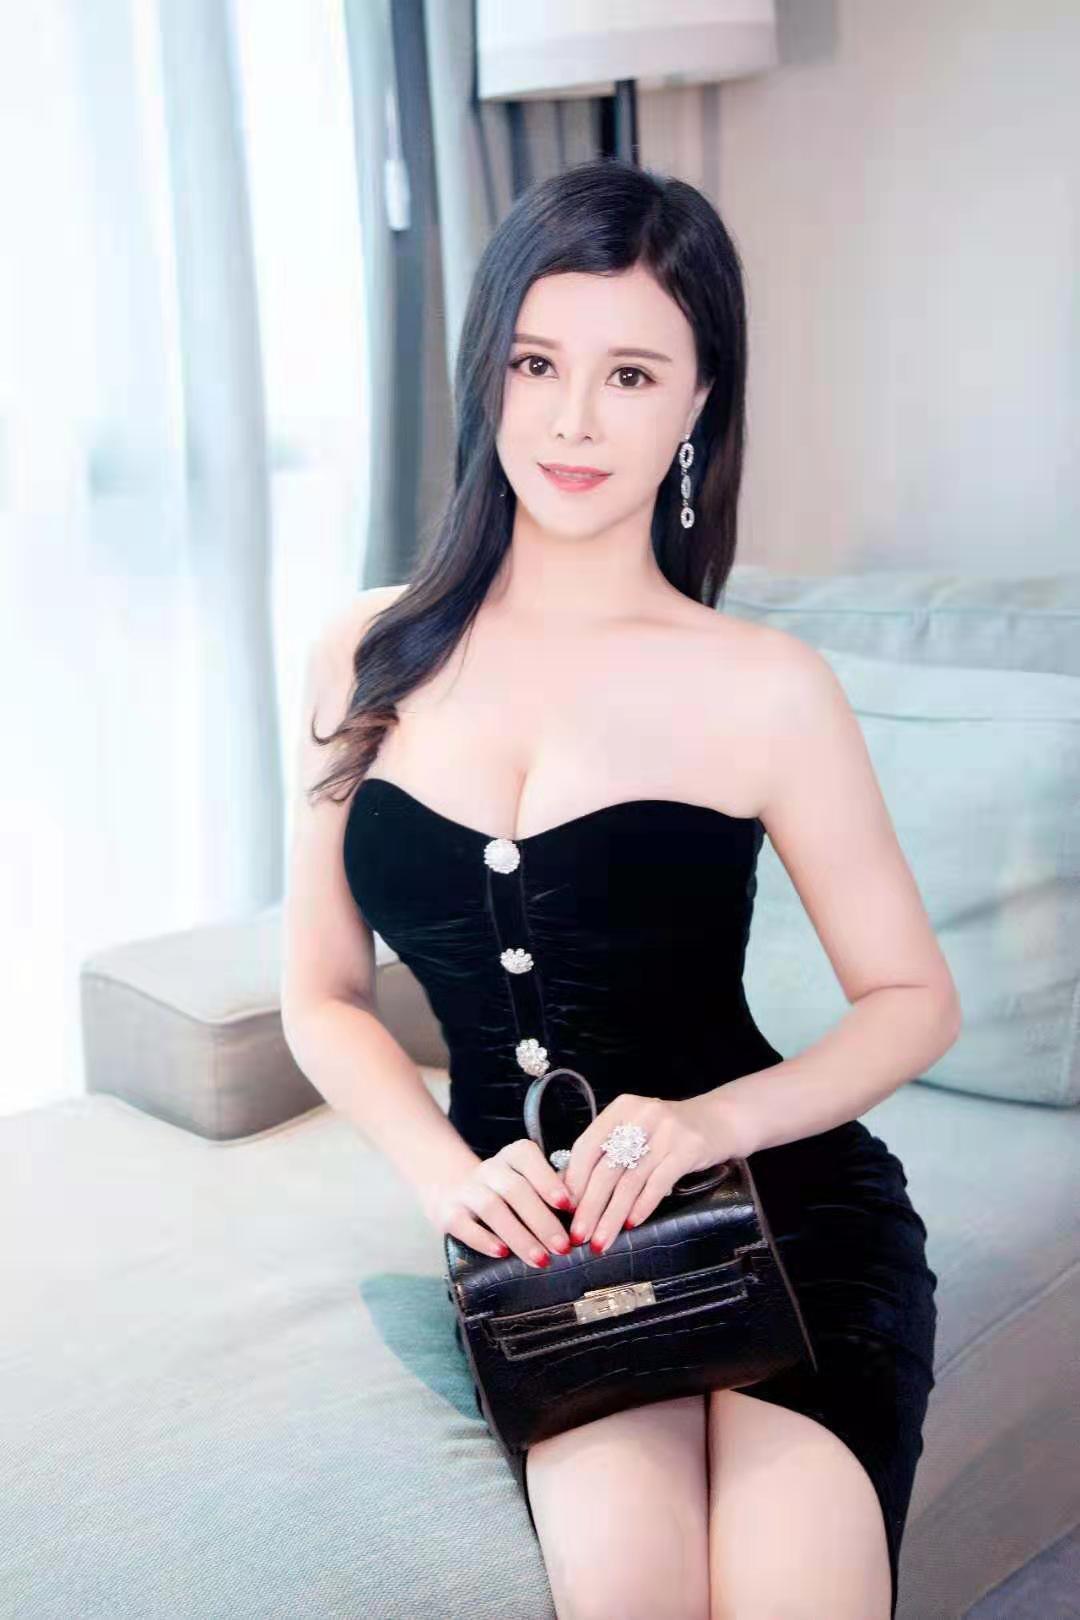 escort i örebro montra thai massage